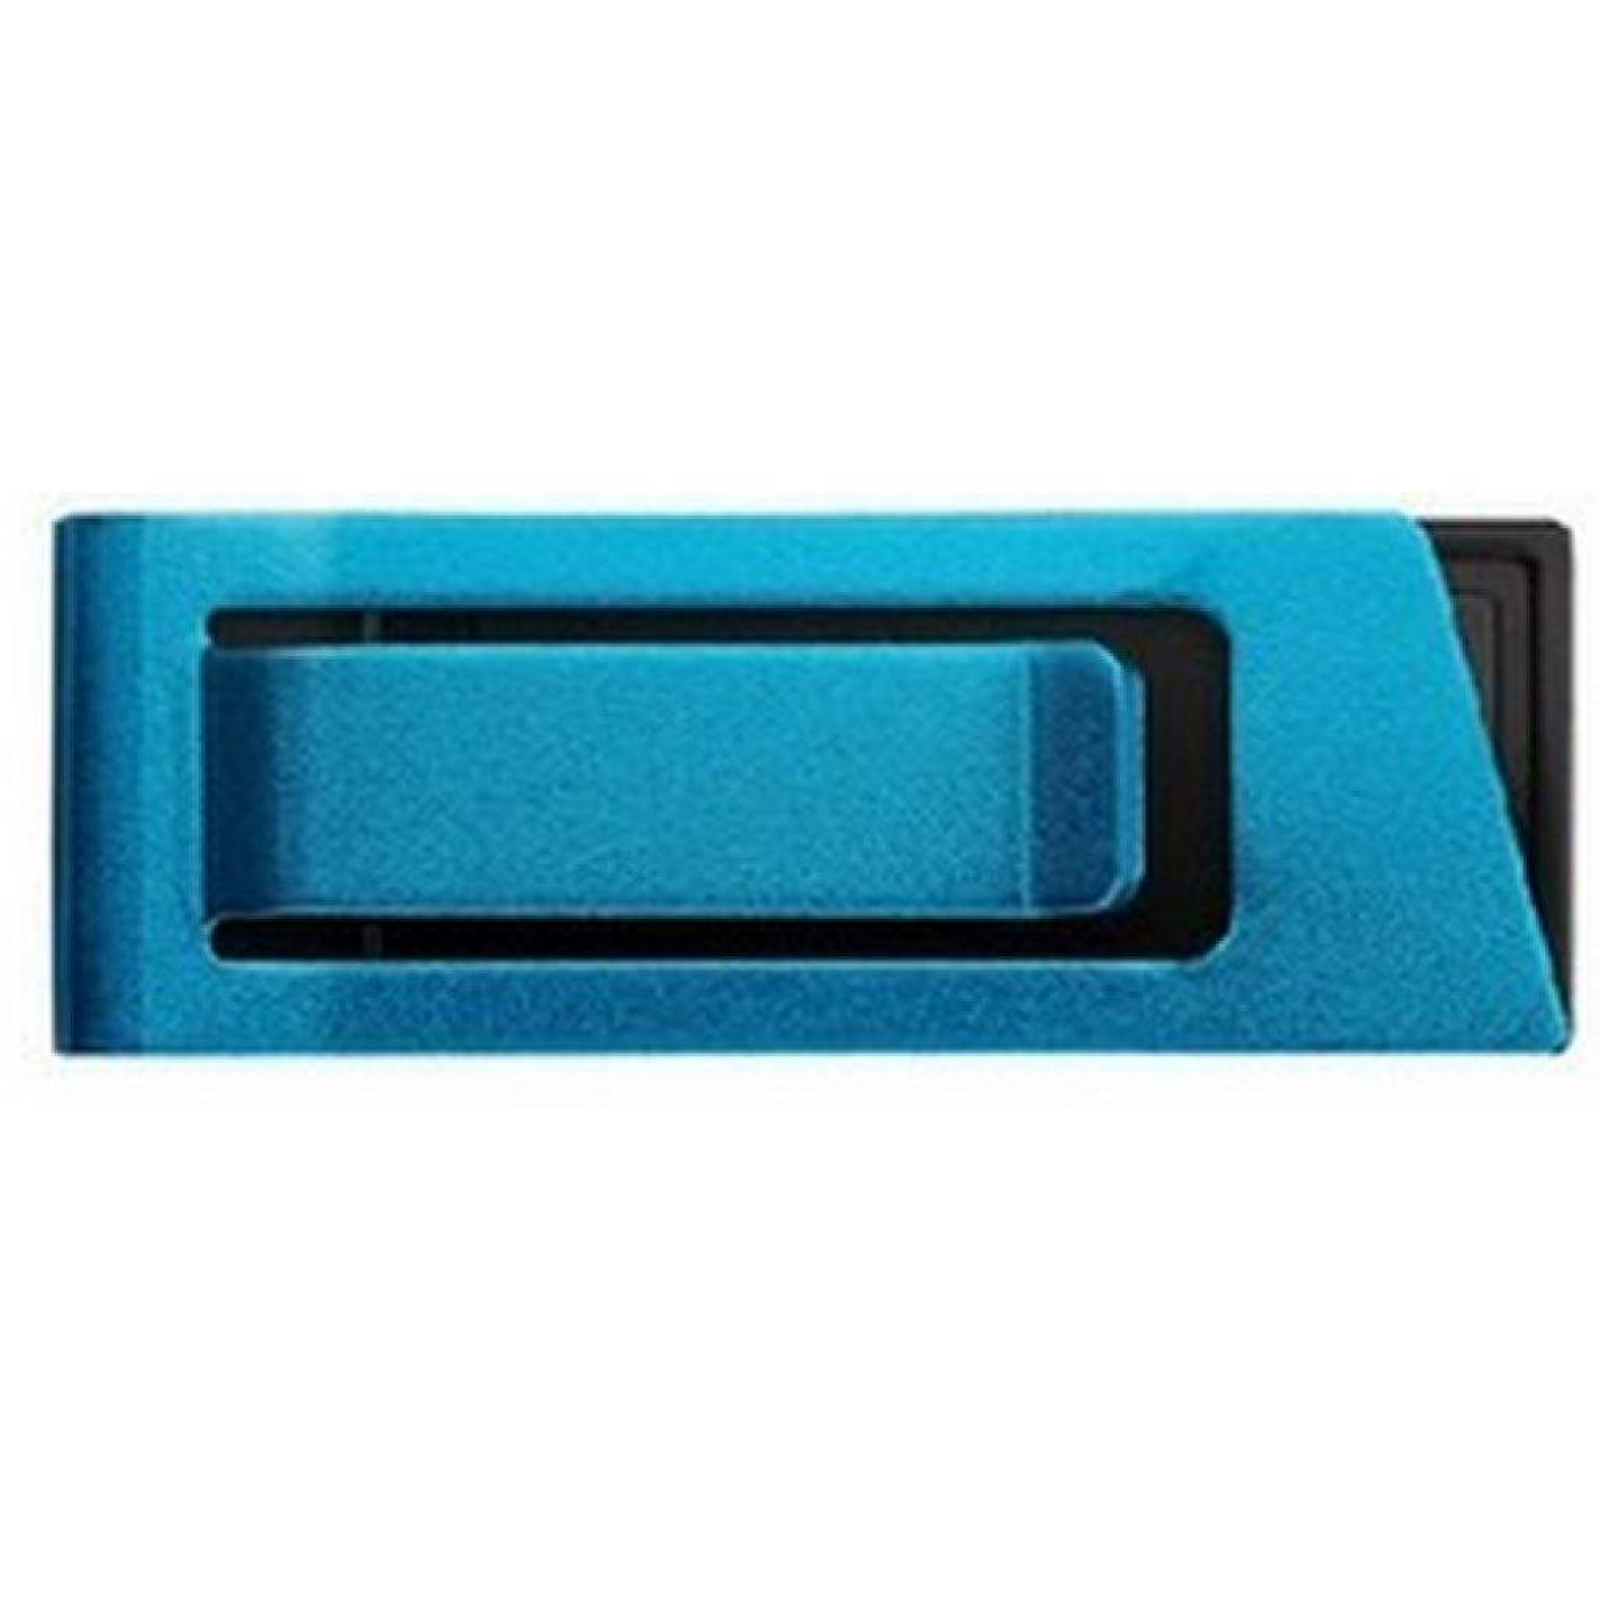 USB флеш накопитель 8GB AH130 Blue RP USB2.0 Apacer (AP8GAH130U-1) изображение 2